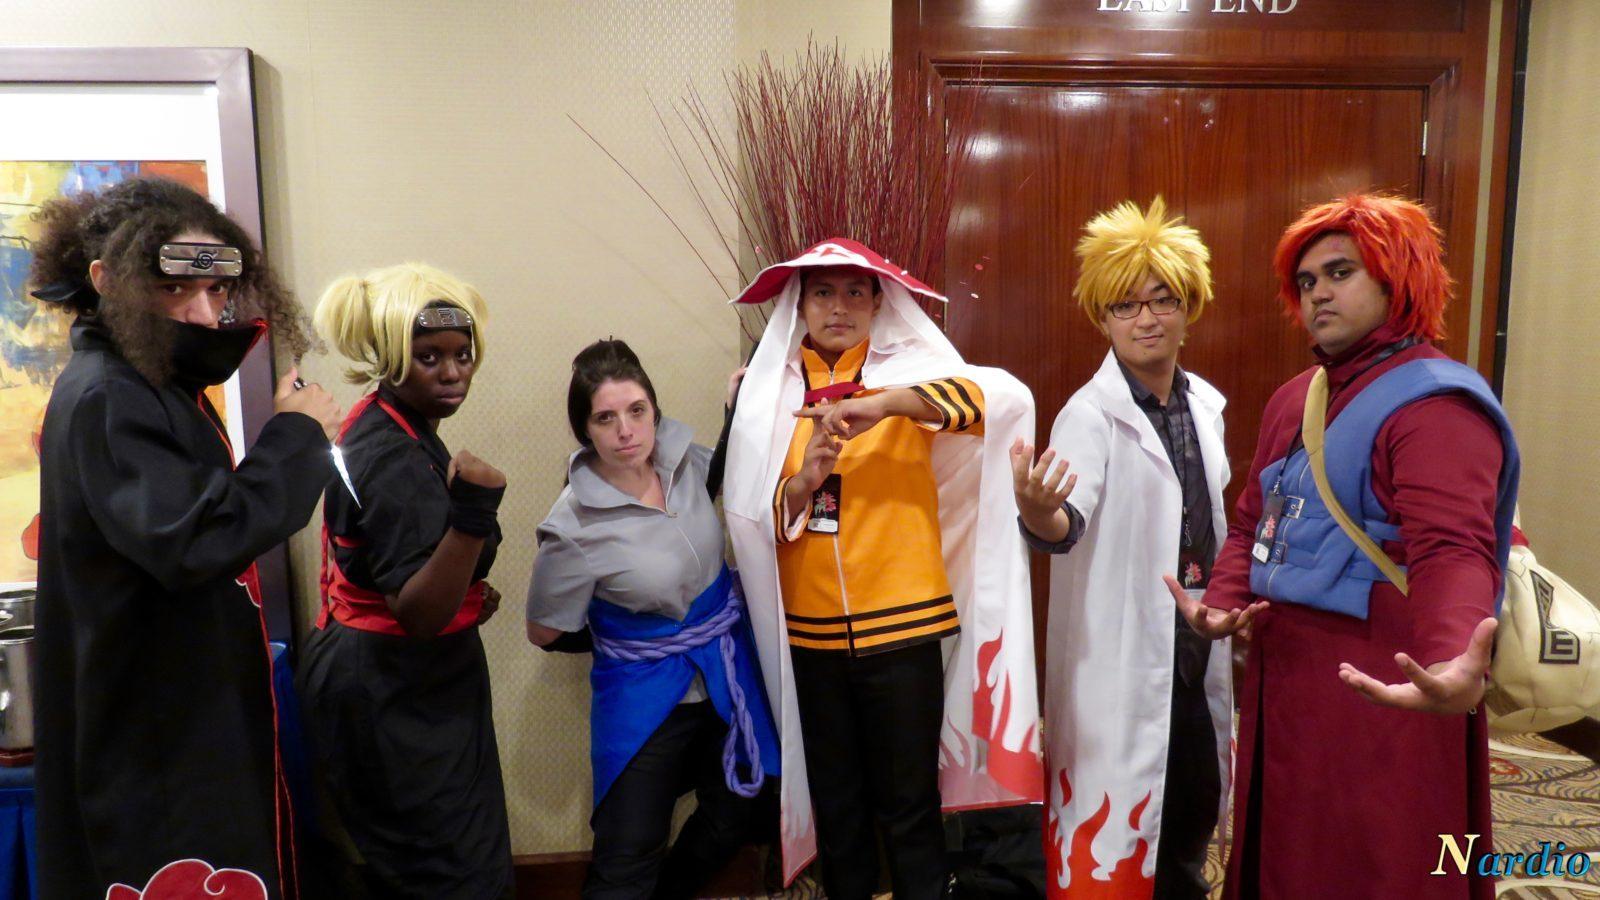 Naruto Cosplay Group Liberty City Con 2016 010 The World Of Nardio